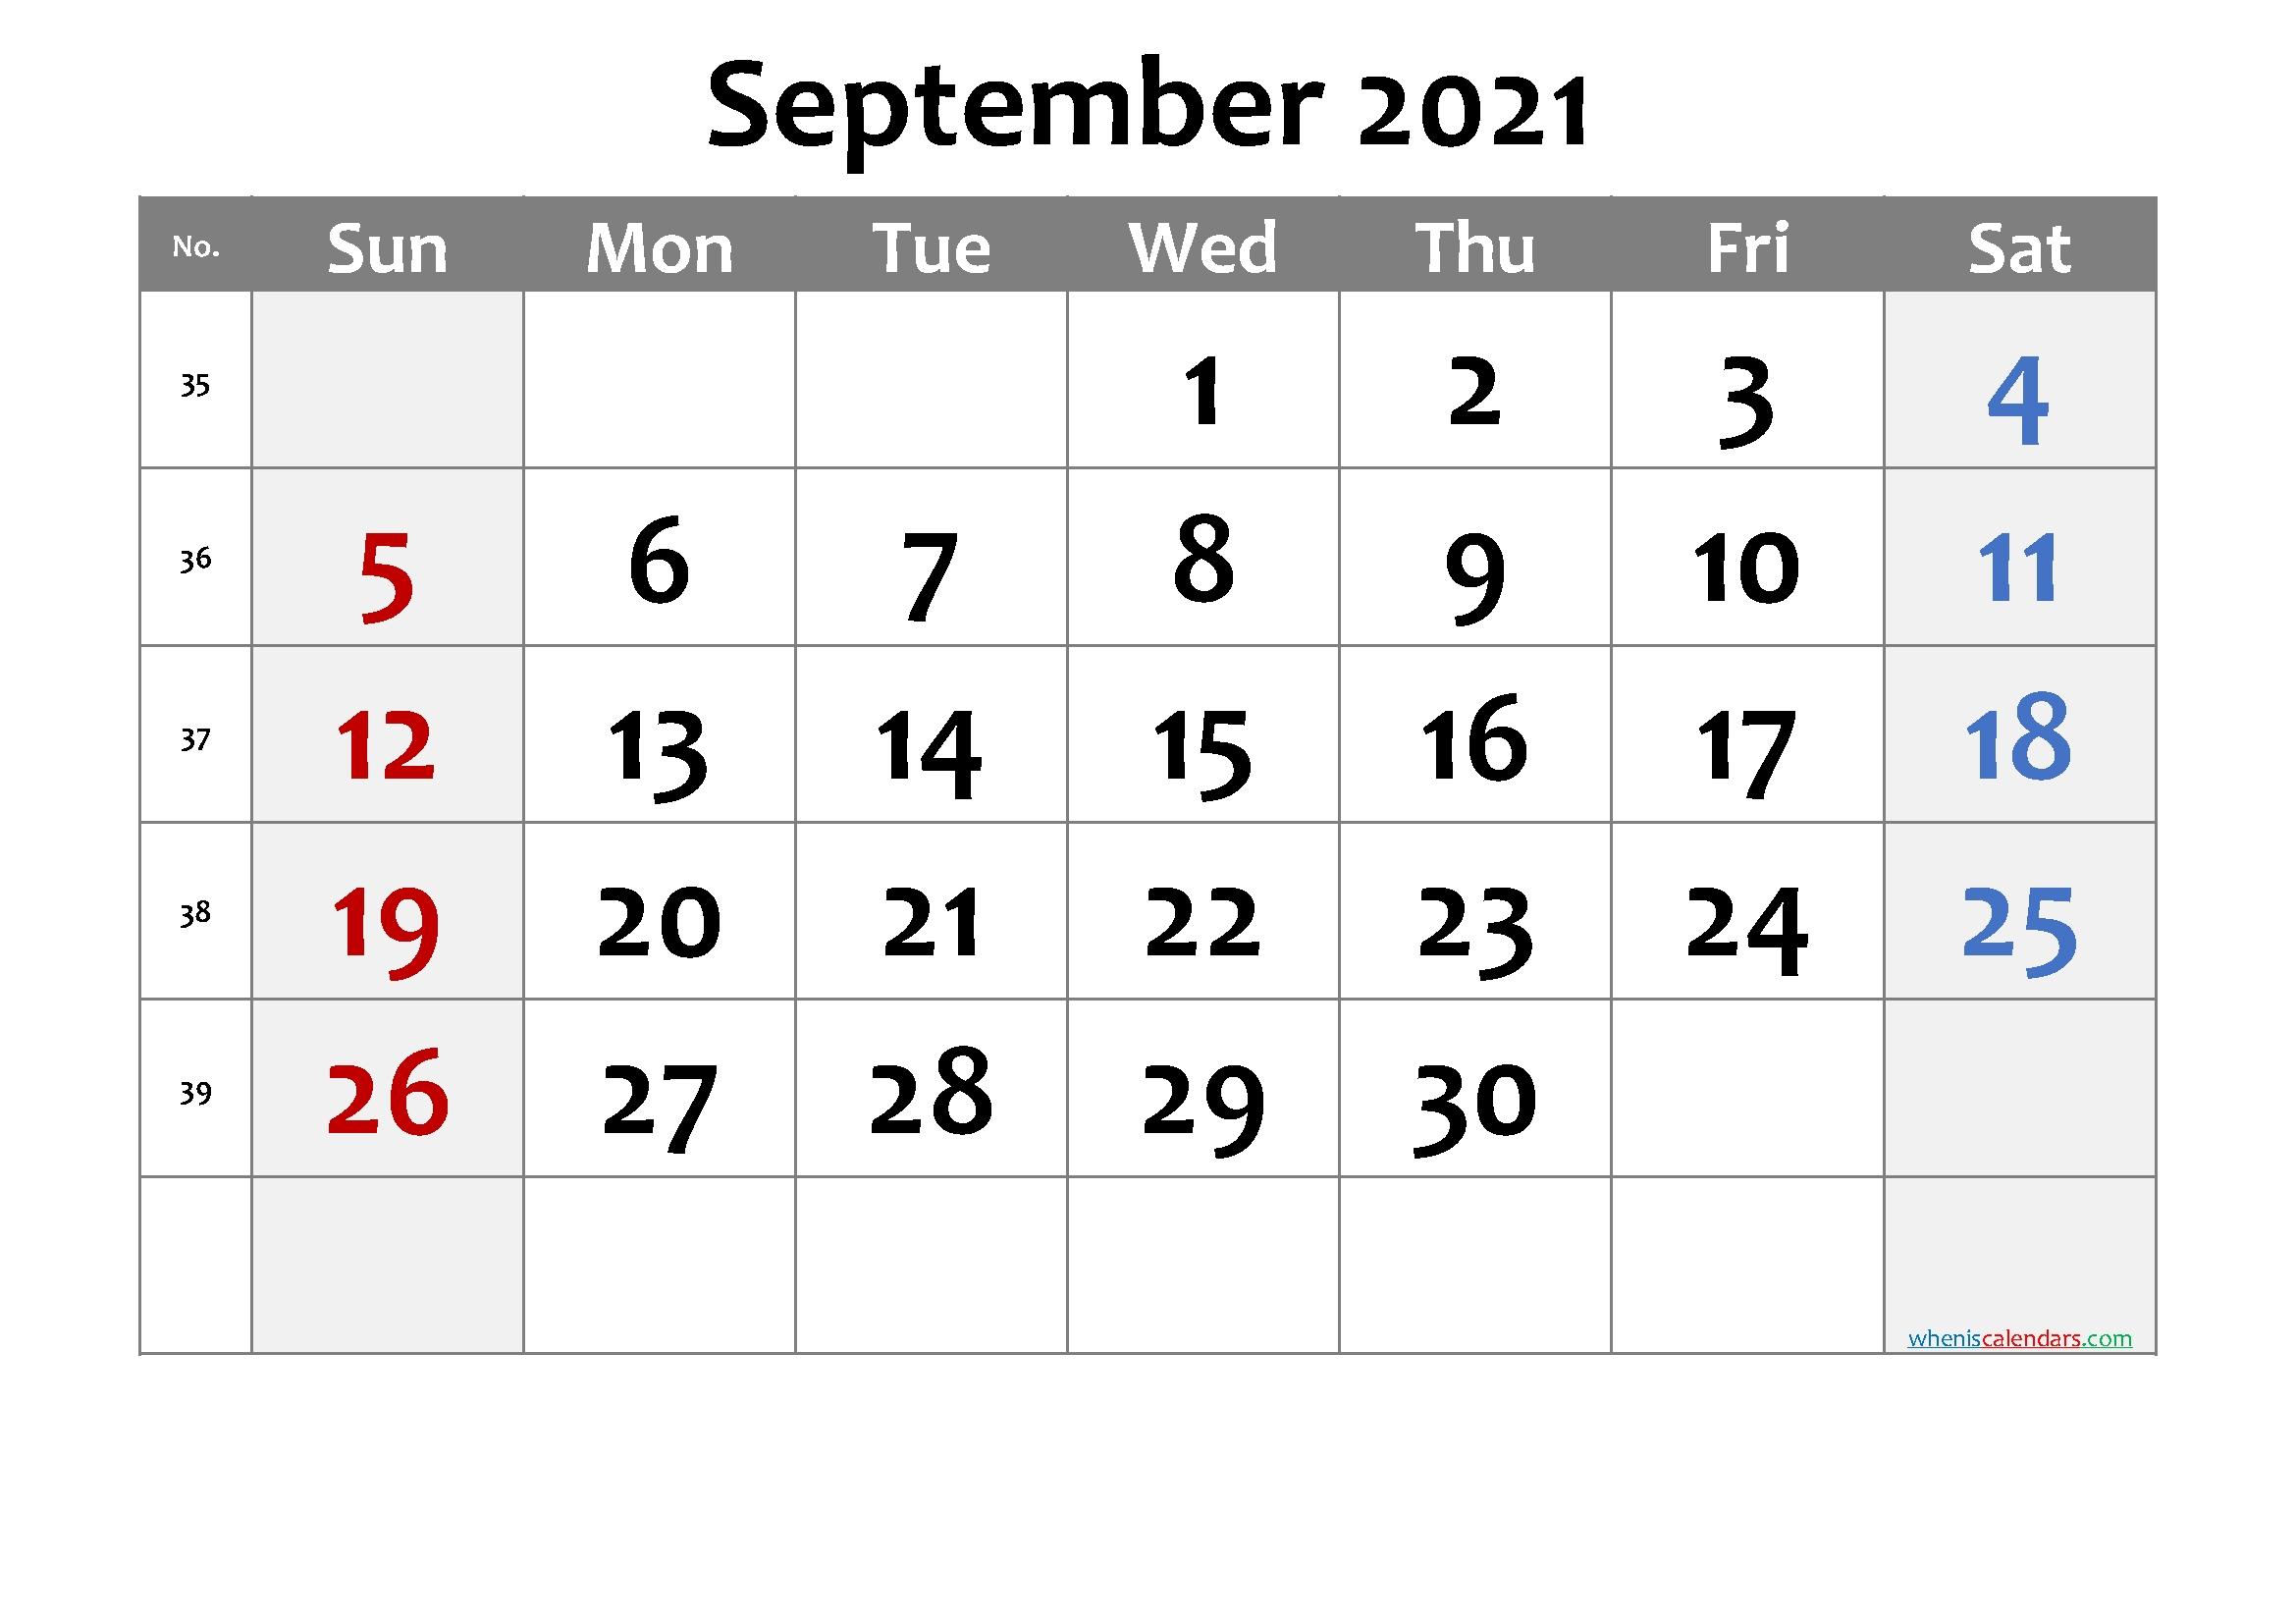 20+ September 2021 Calendar - Free Download Printable Calendar Templates ️ September 2021 Lunar Calendar